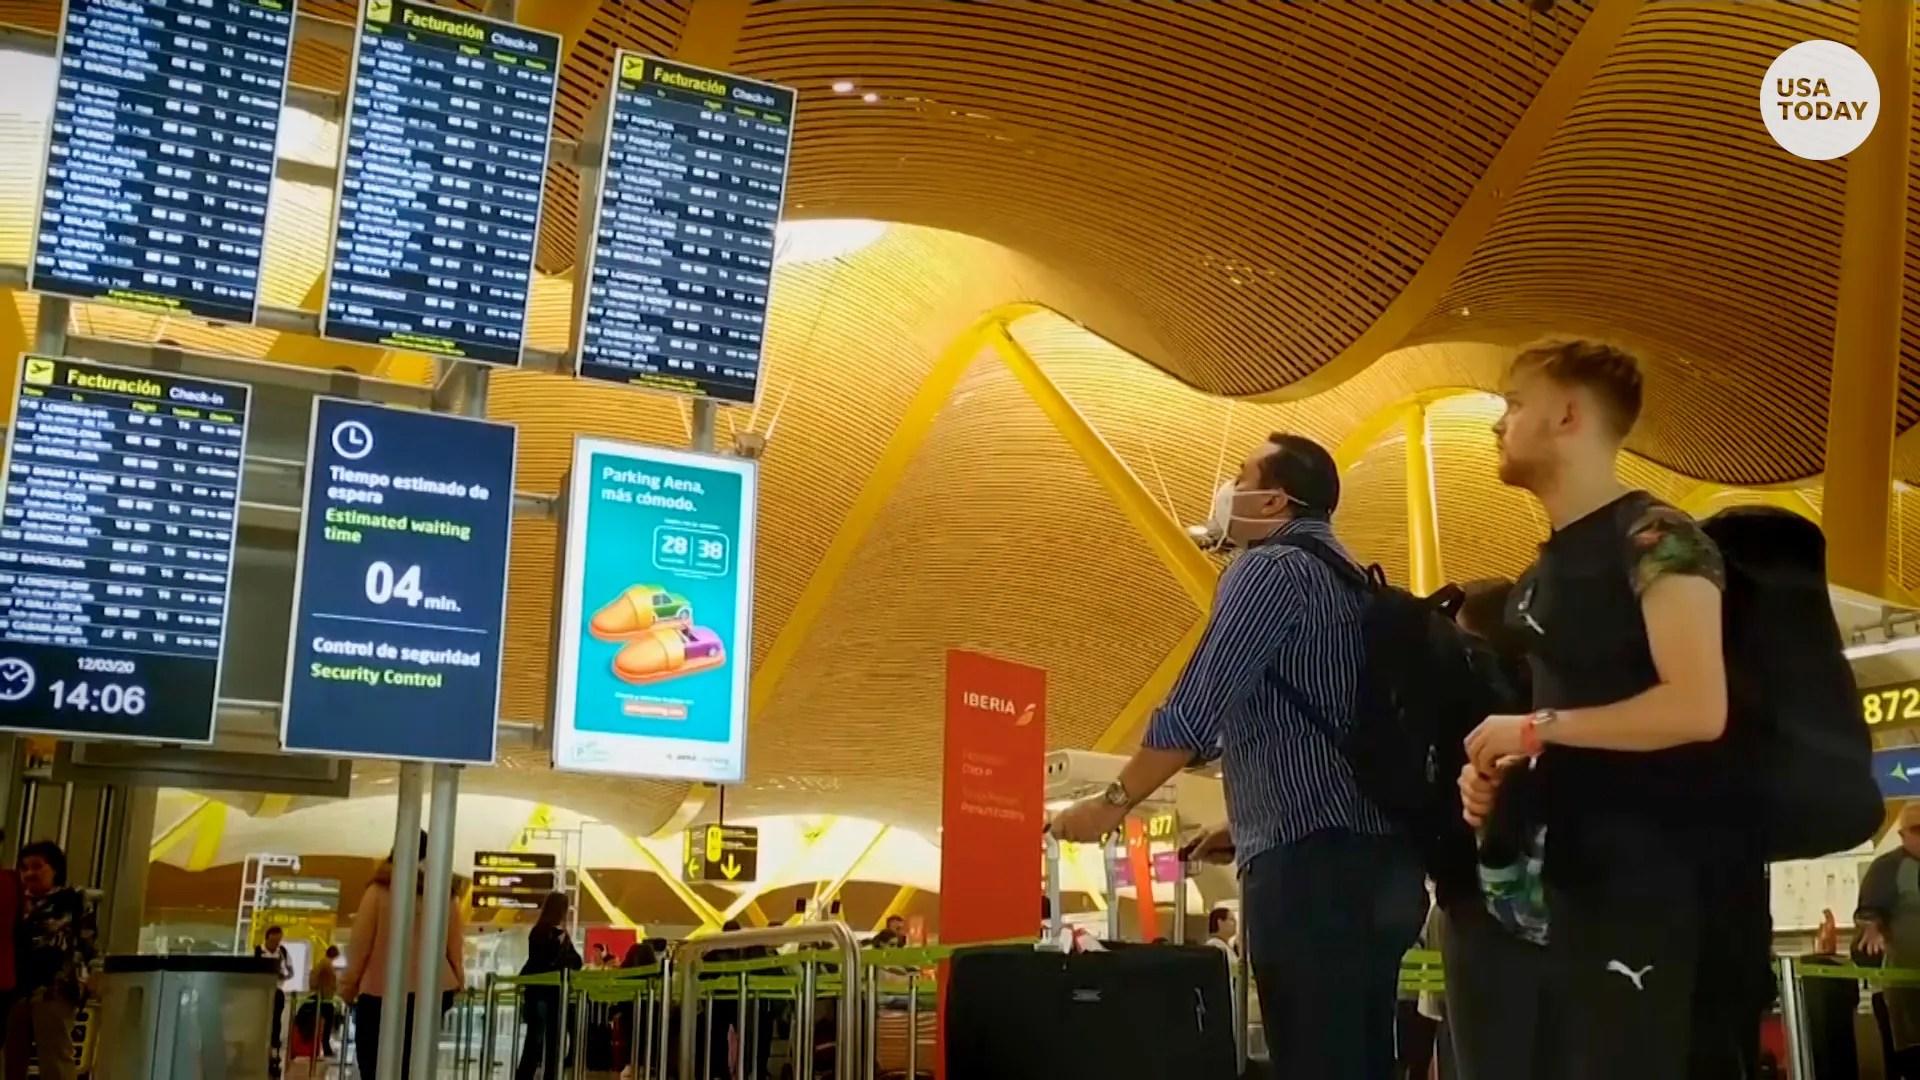 Coronavirus Trump travel ban: Travelers scramble; fare caps announced